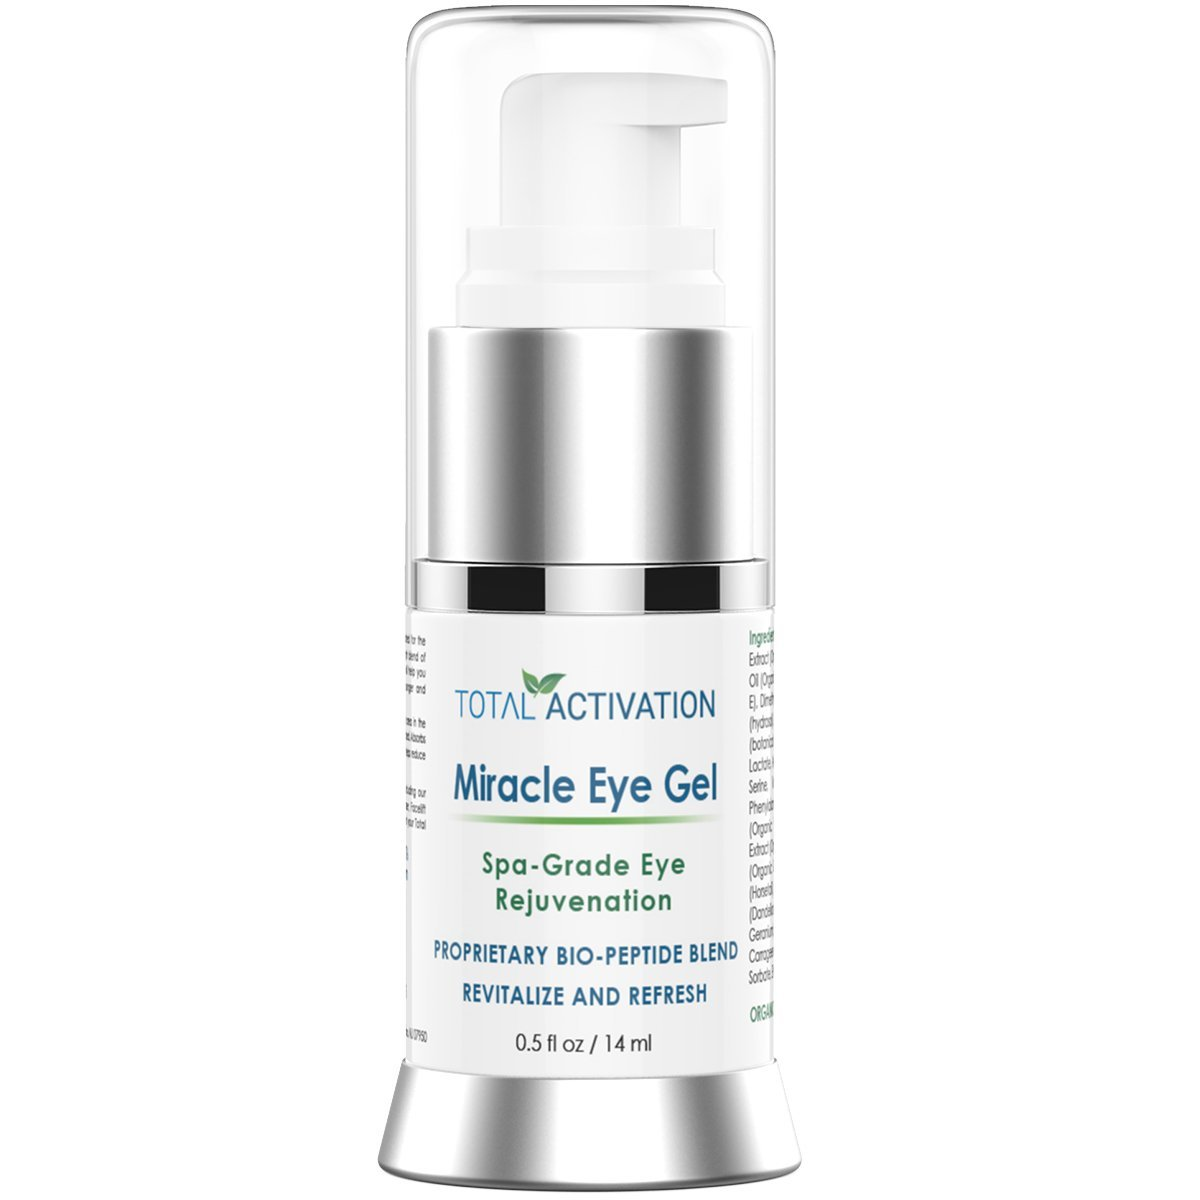 Anti Wrinkle Collagen Eye Serum for Men and Women, Age Spot Treatment, Anti Aging Gel, Replaces Retinol Face & Eye Skin Cream, Day & Night Dark Circle Under Eye Treatment, 0.5 oz Total Activation